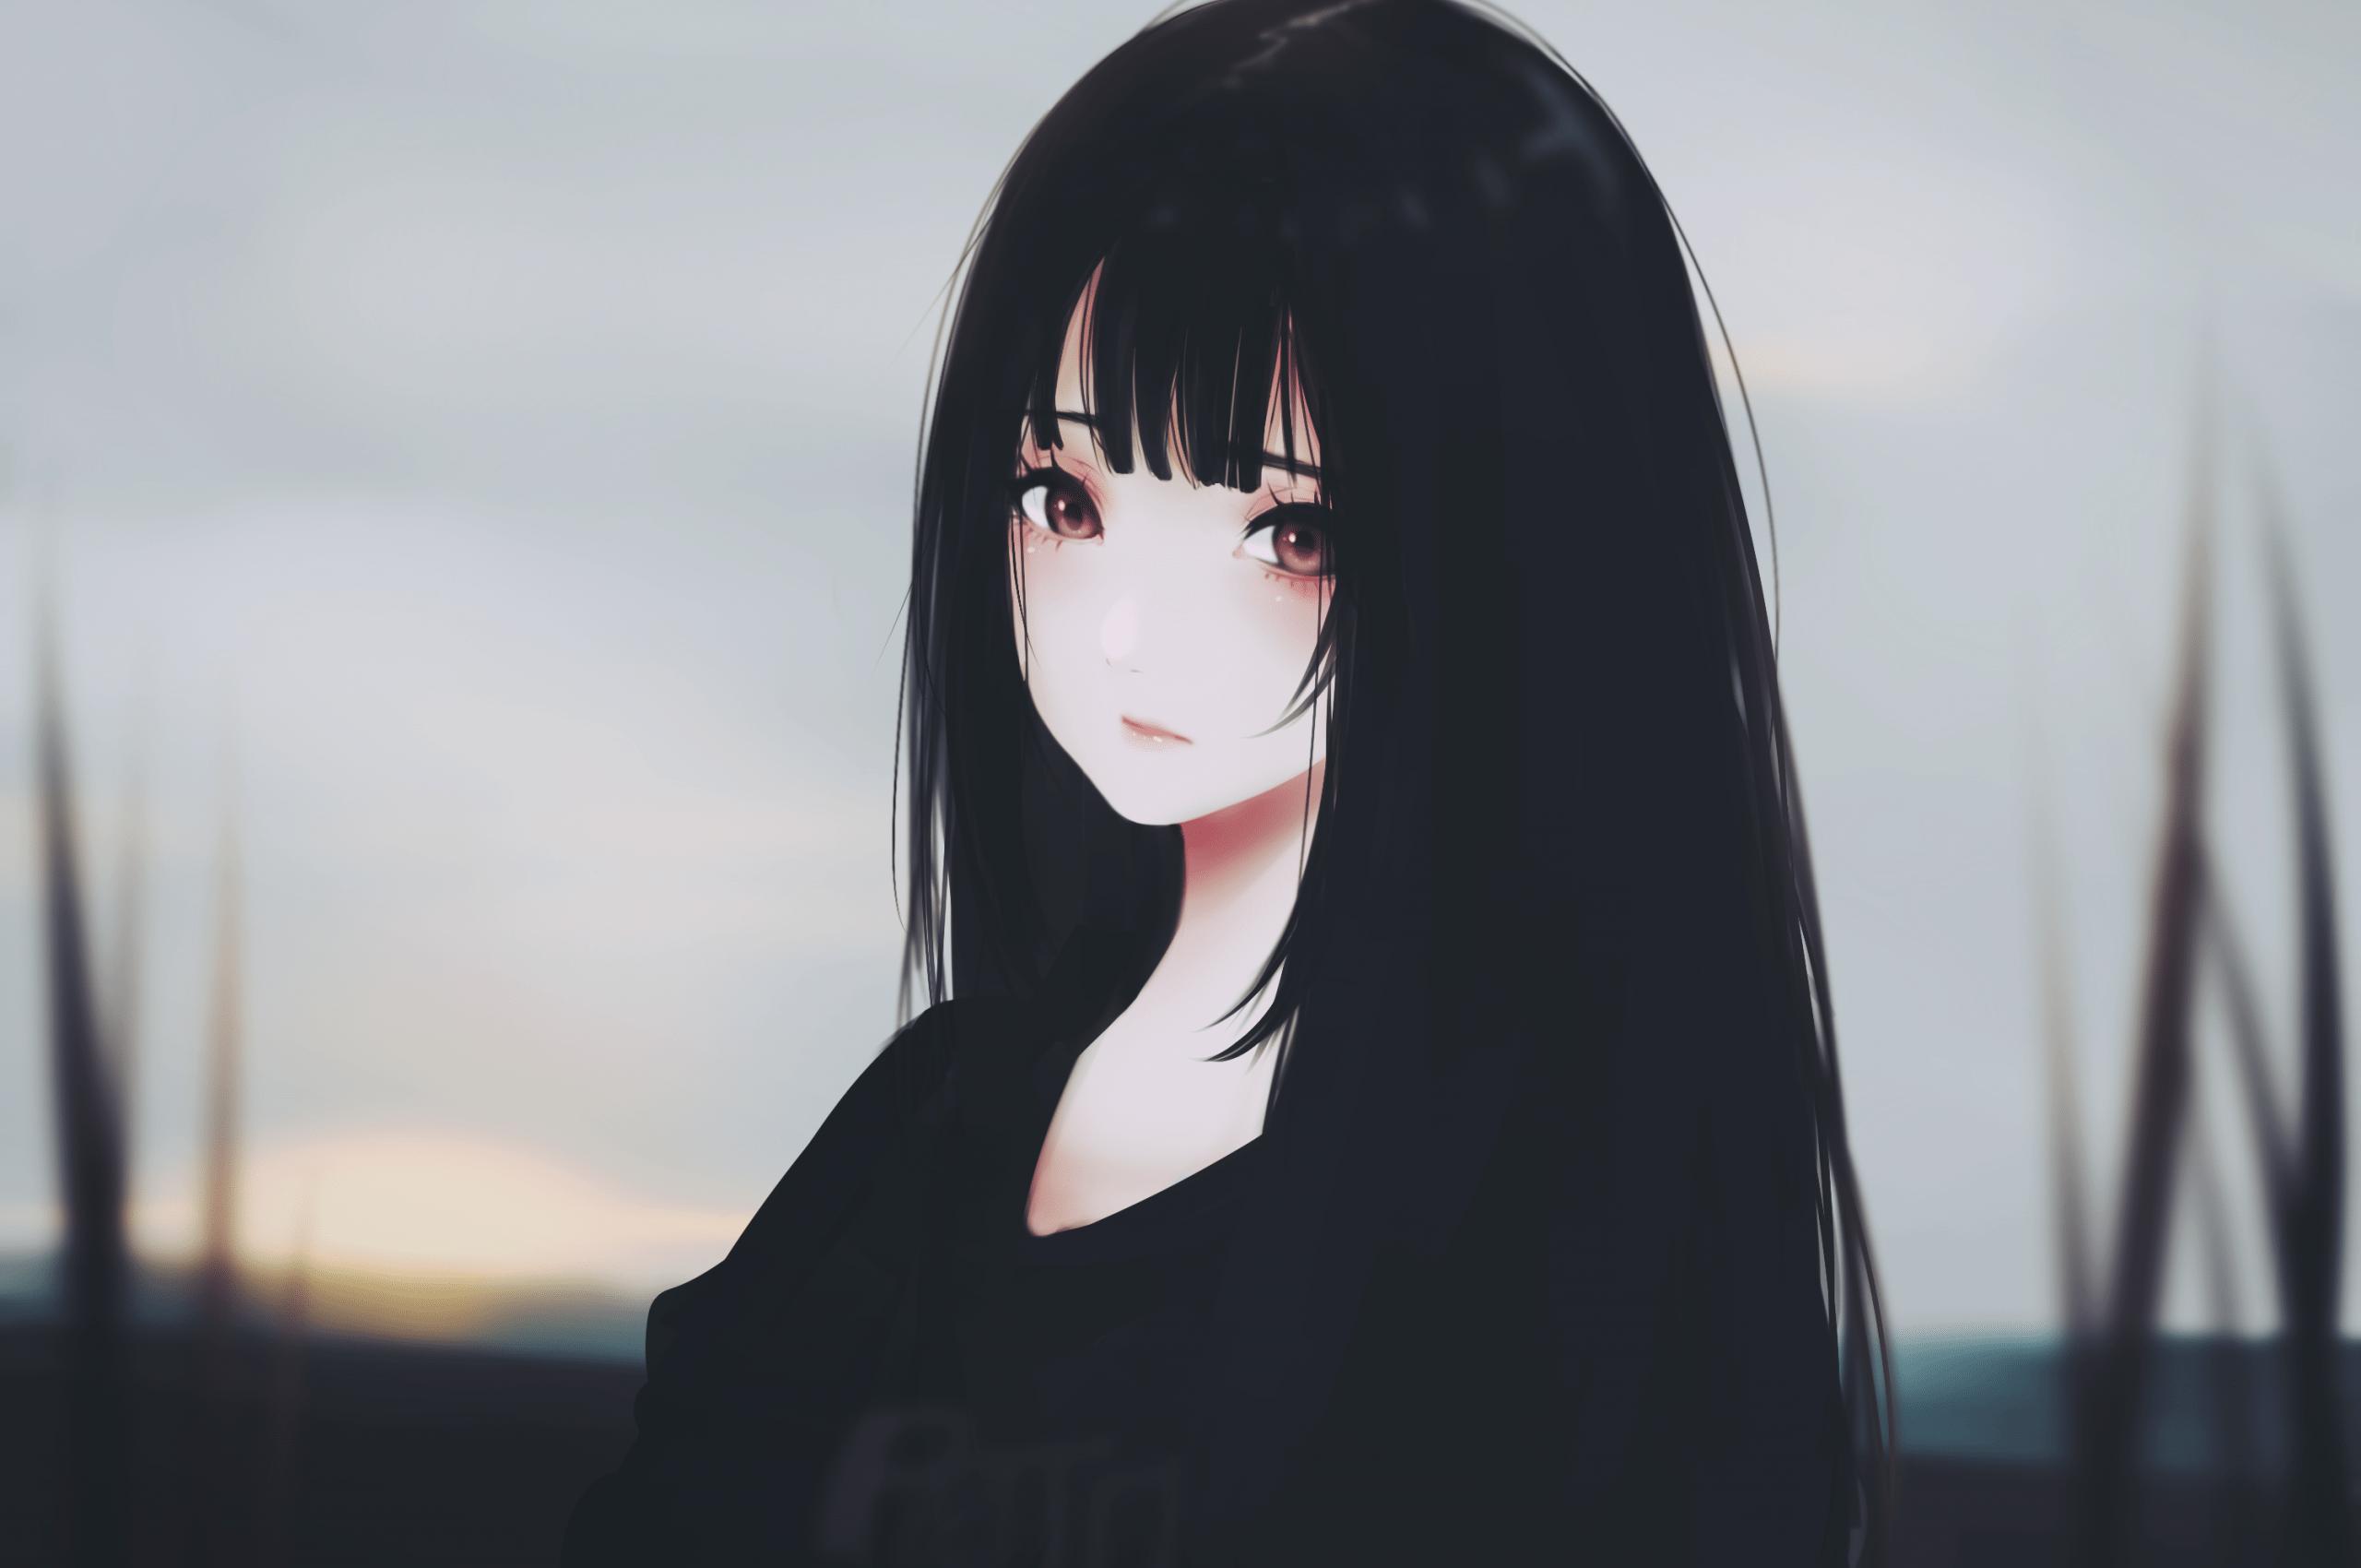 Hair girl black 7 Reasons